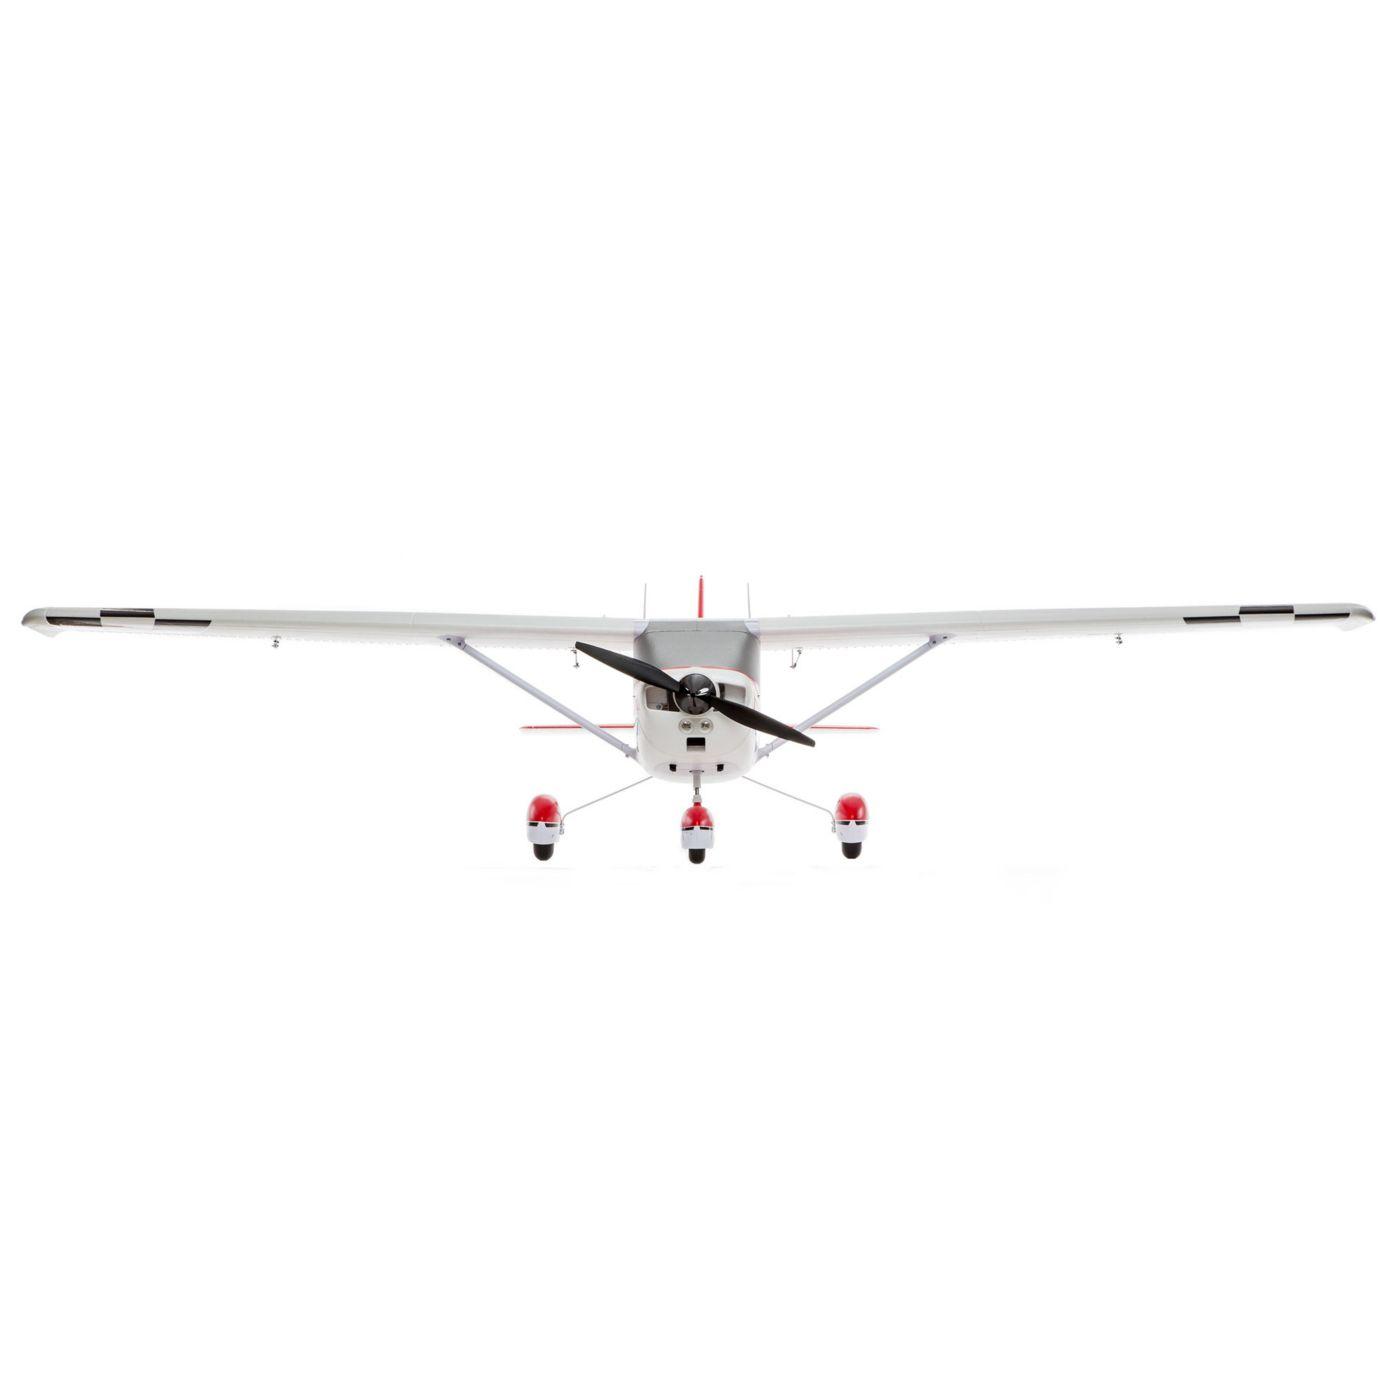 E-flite Spanndraht Montageset Carbon-Z Floats EFLA5605 CZ Cessna 150